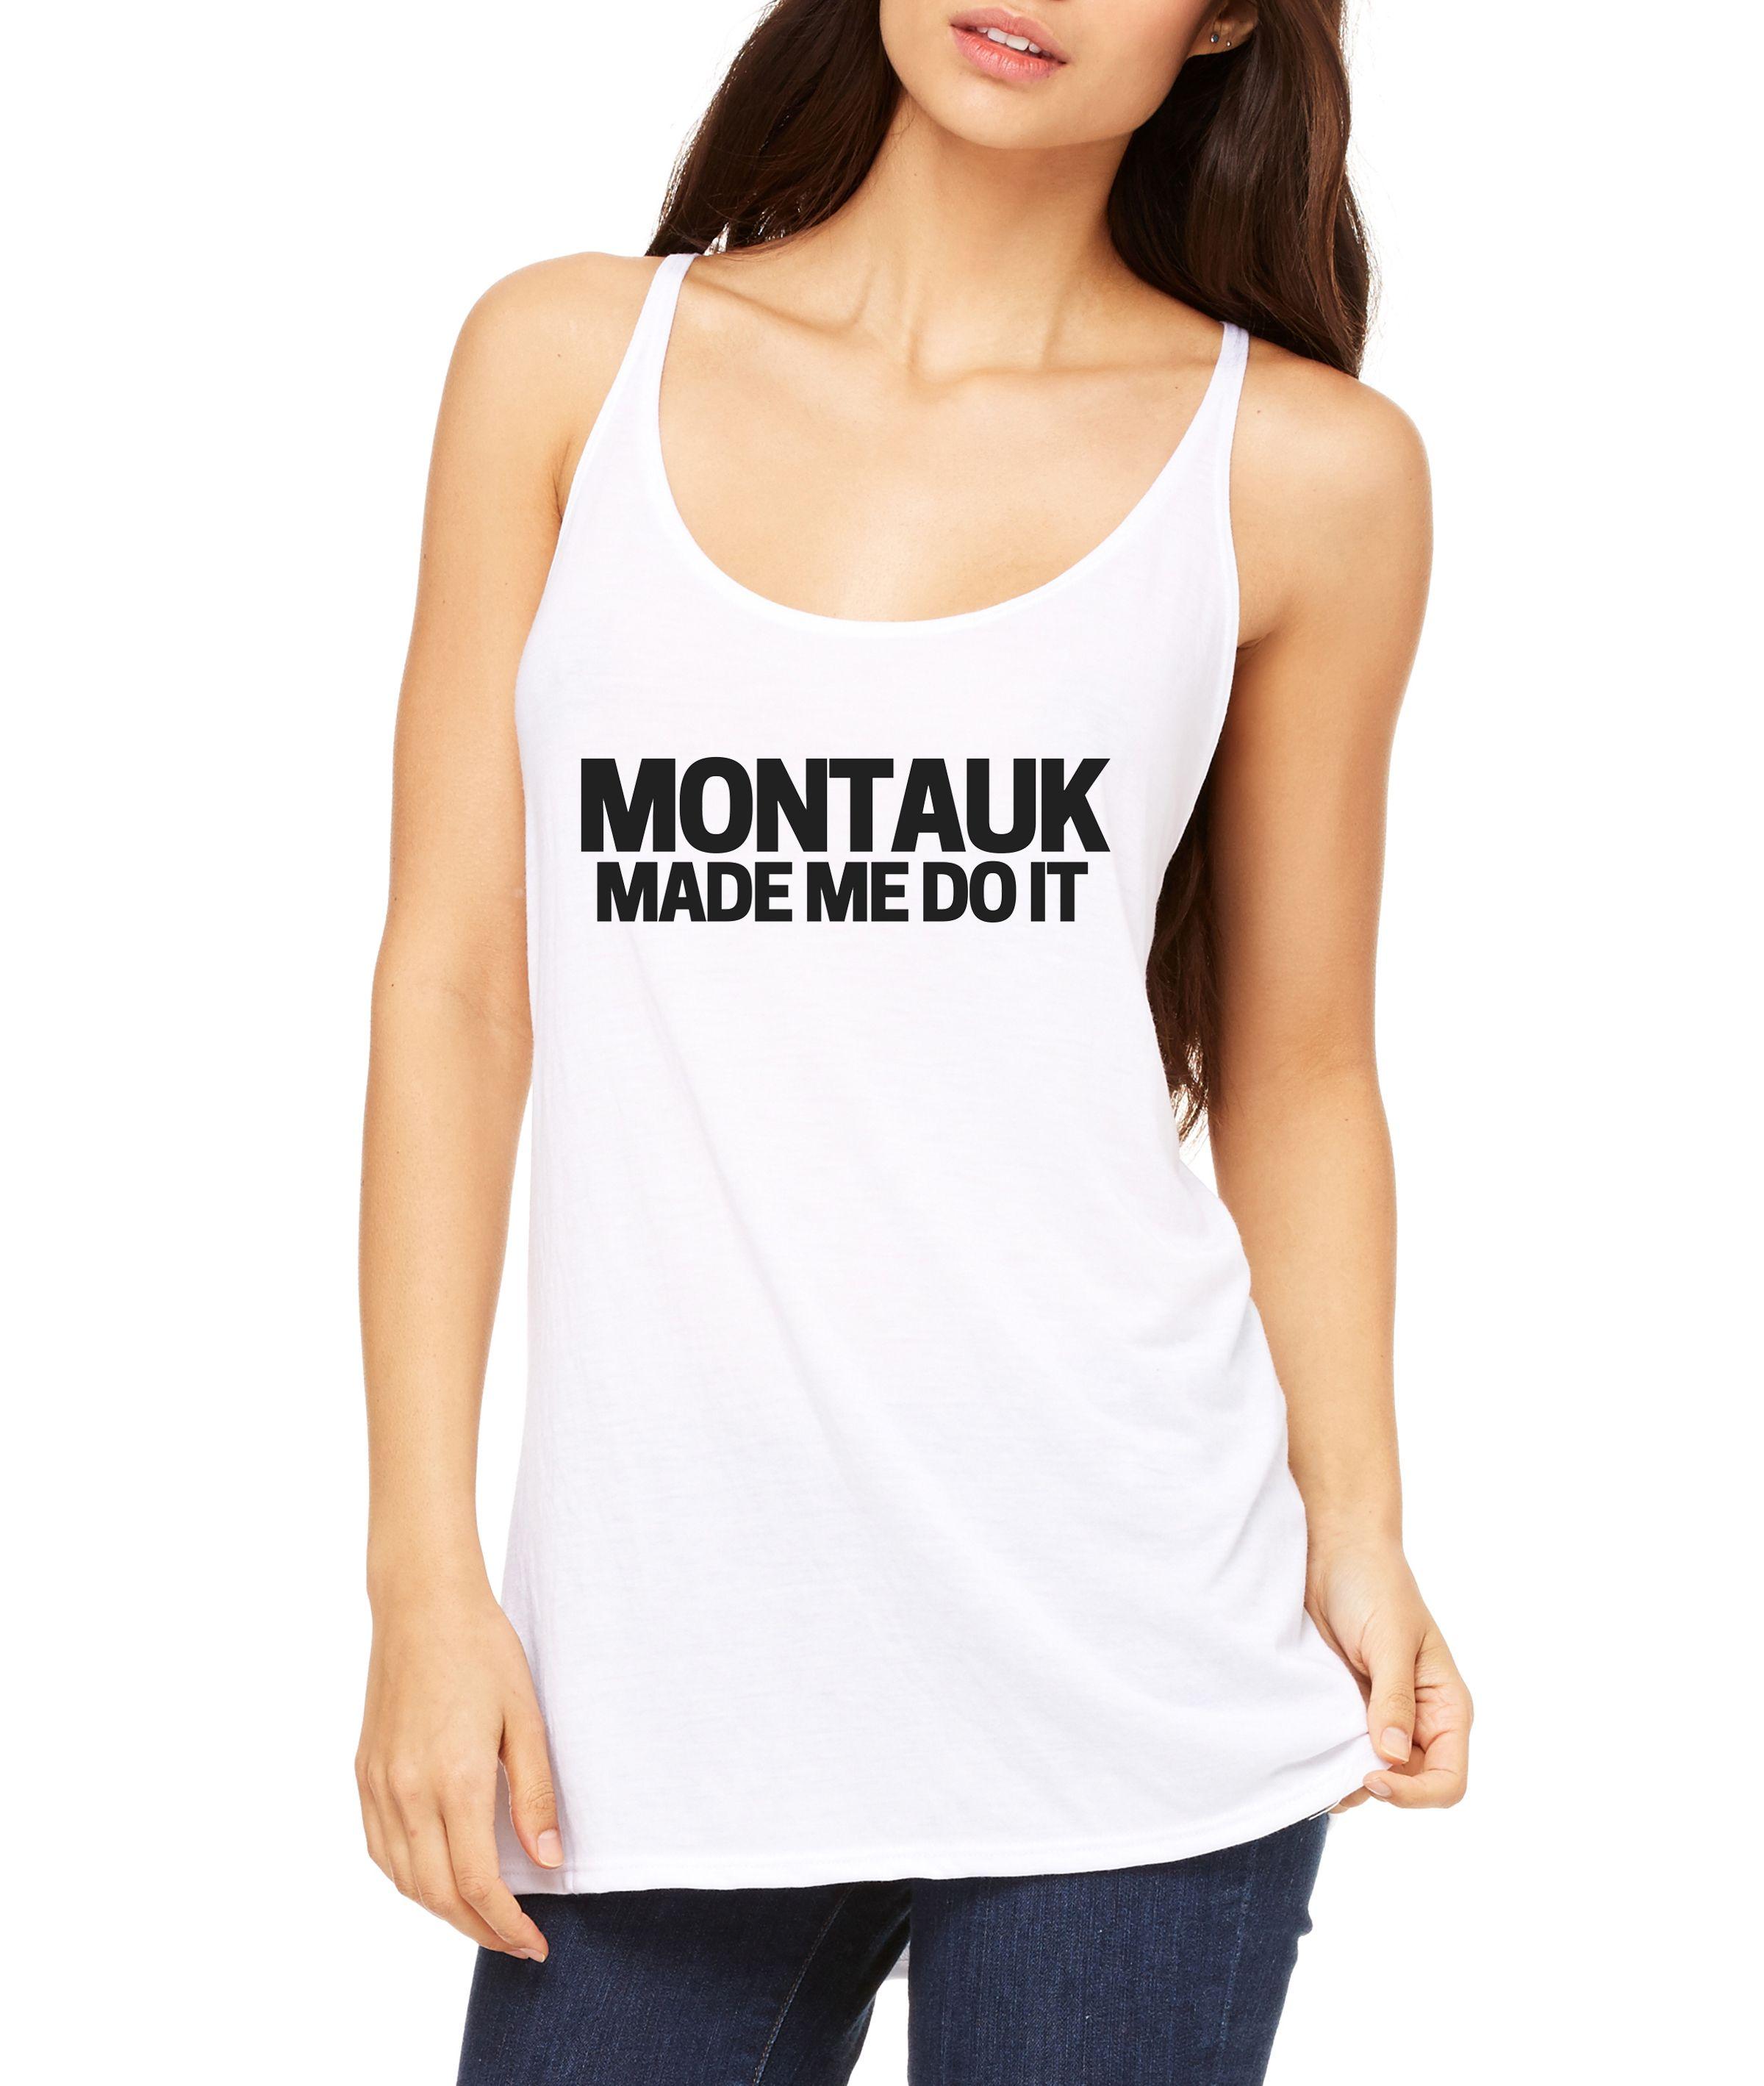 Montauk Women's Slouchy Tank